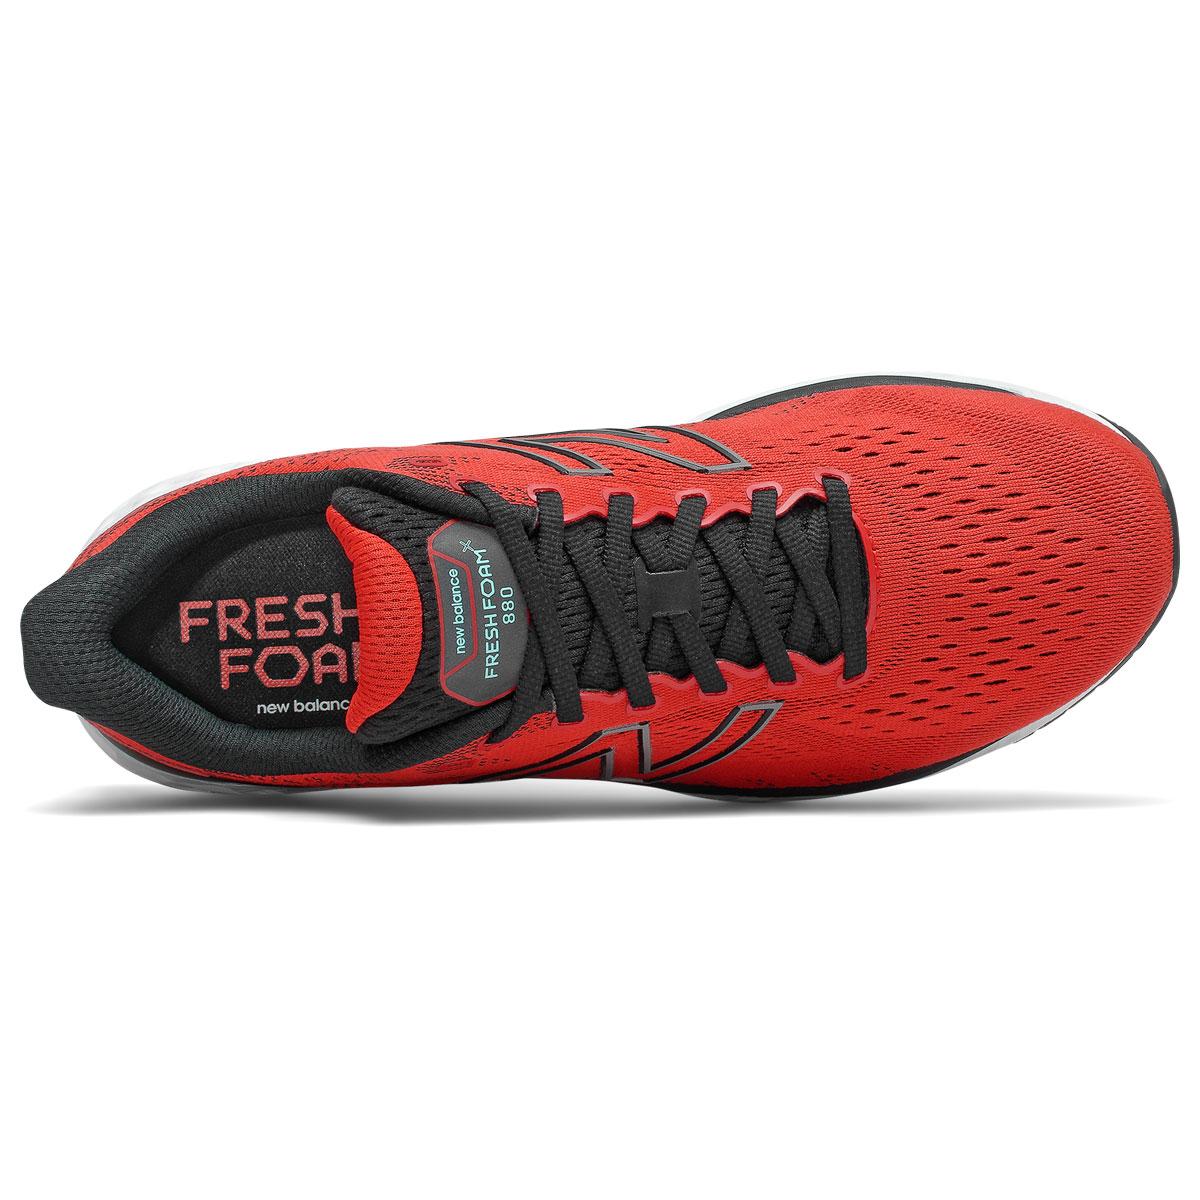 Men's New Balance Fresh Foam 880v11 Running Shoe - Color: Velocity Red/Black - Size: 8 - Width: Wide, Velocity Red/Black, large, image 3